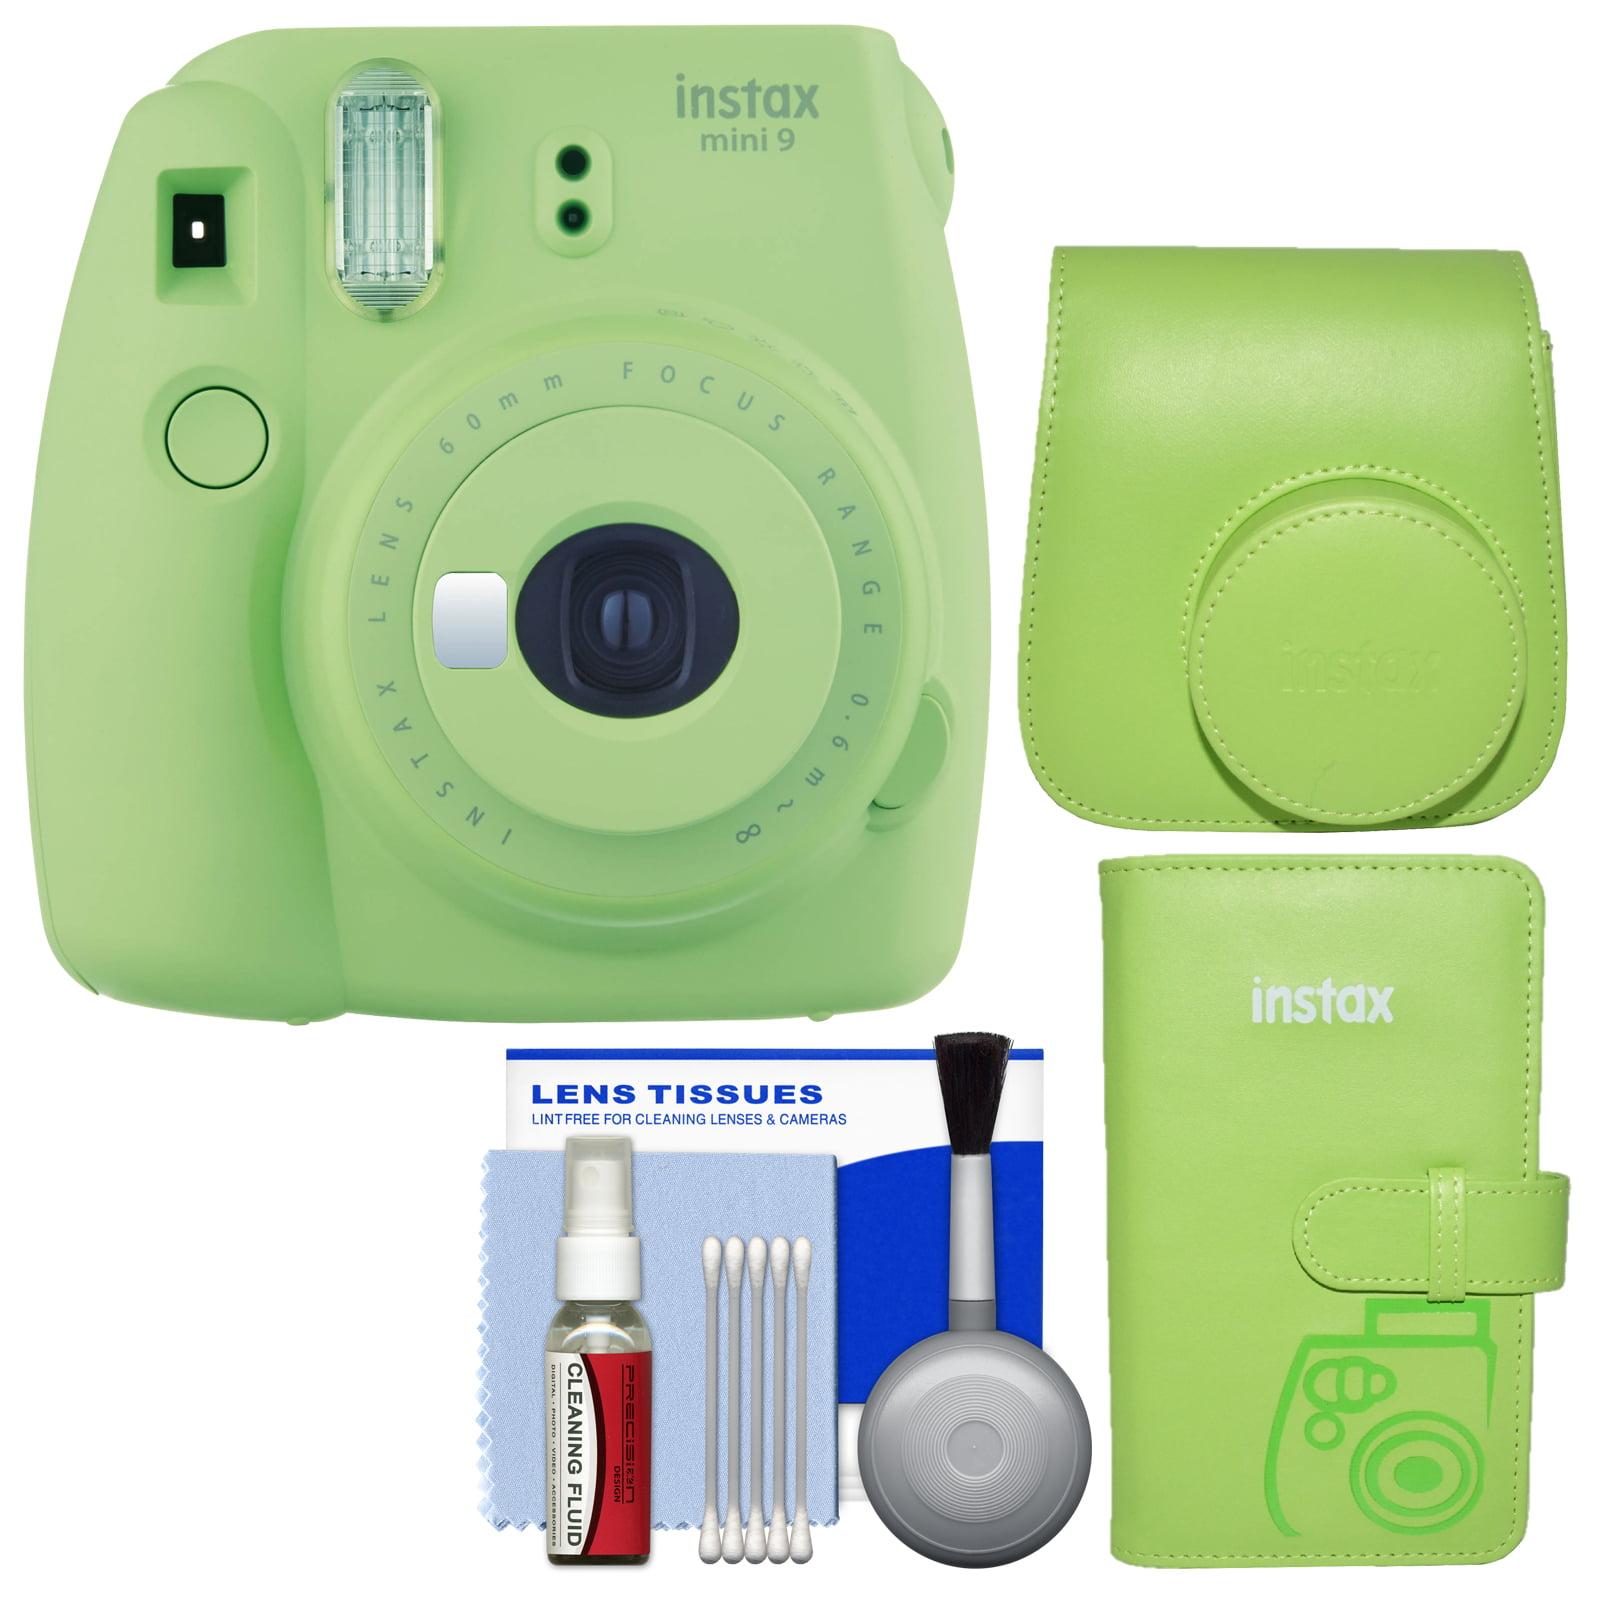 Fujifilm Instax Mini 9 Instant Film Camera (Cobalt Blue) with Groovy Case + Photo Album + Kit